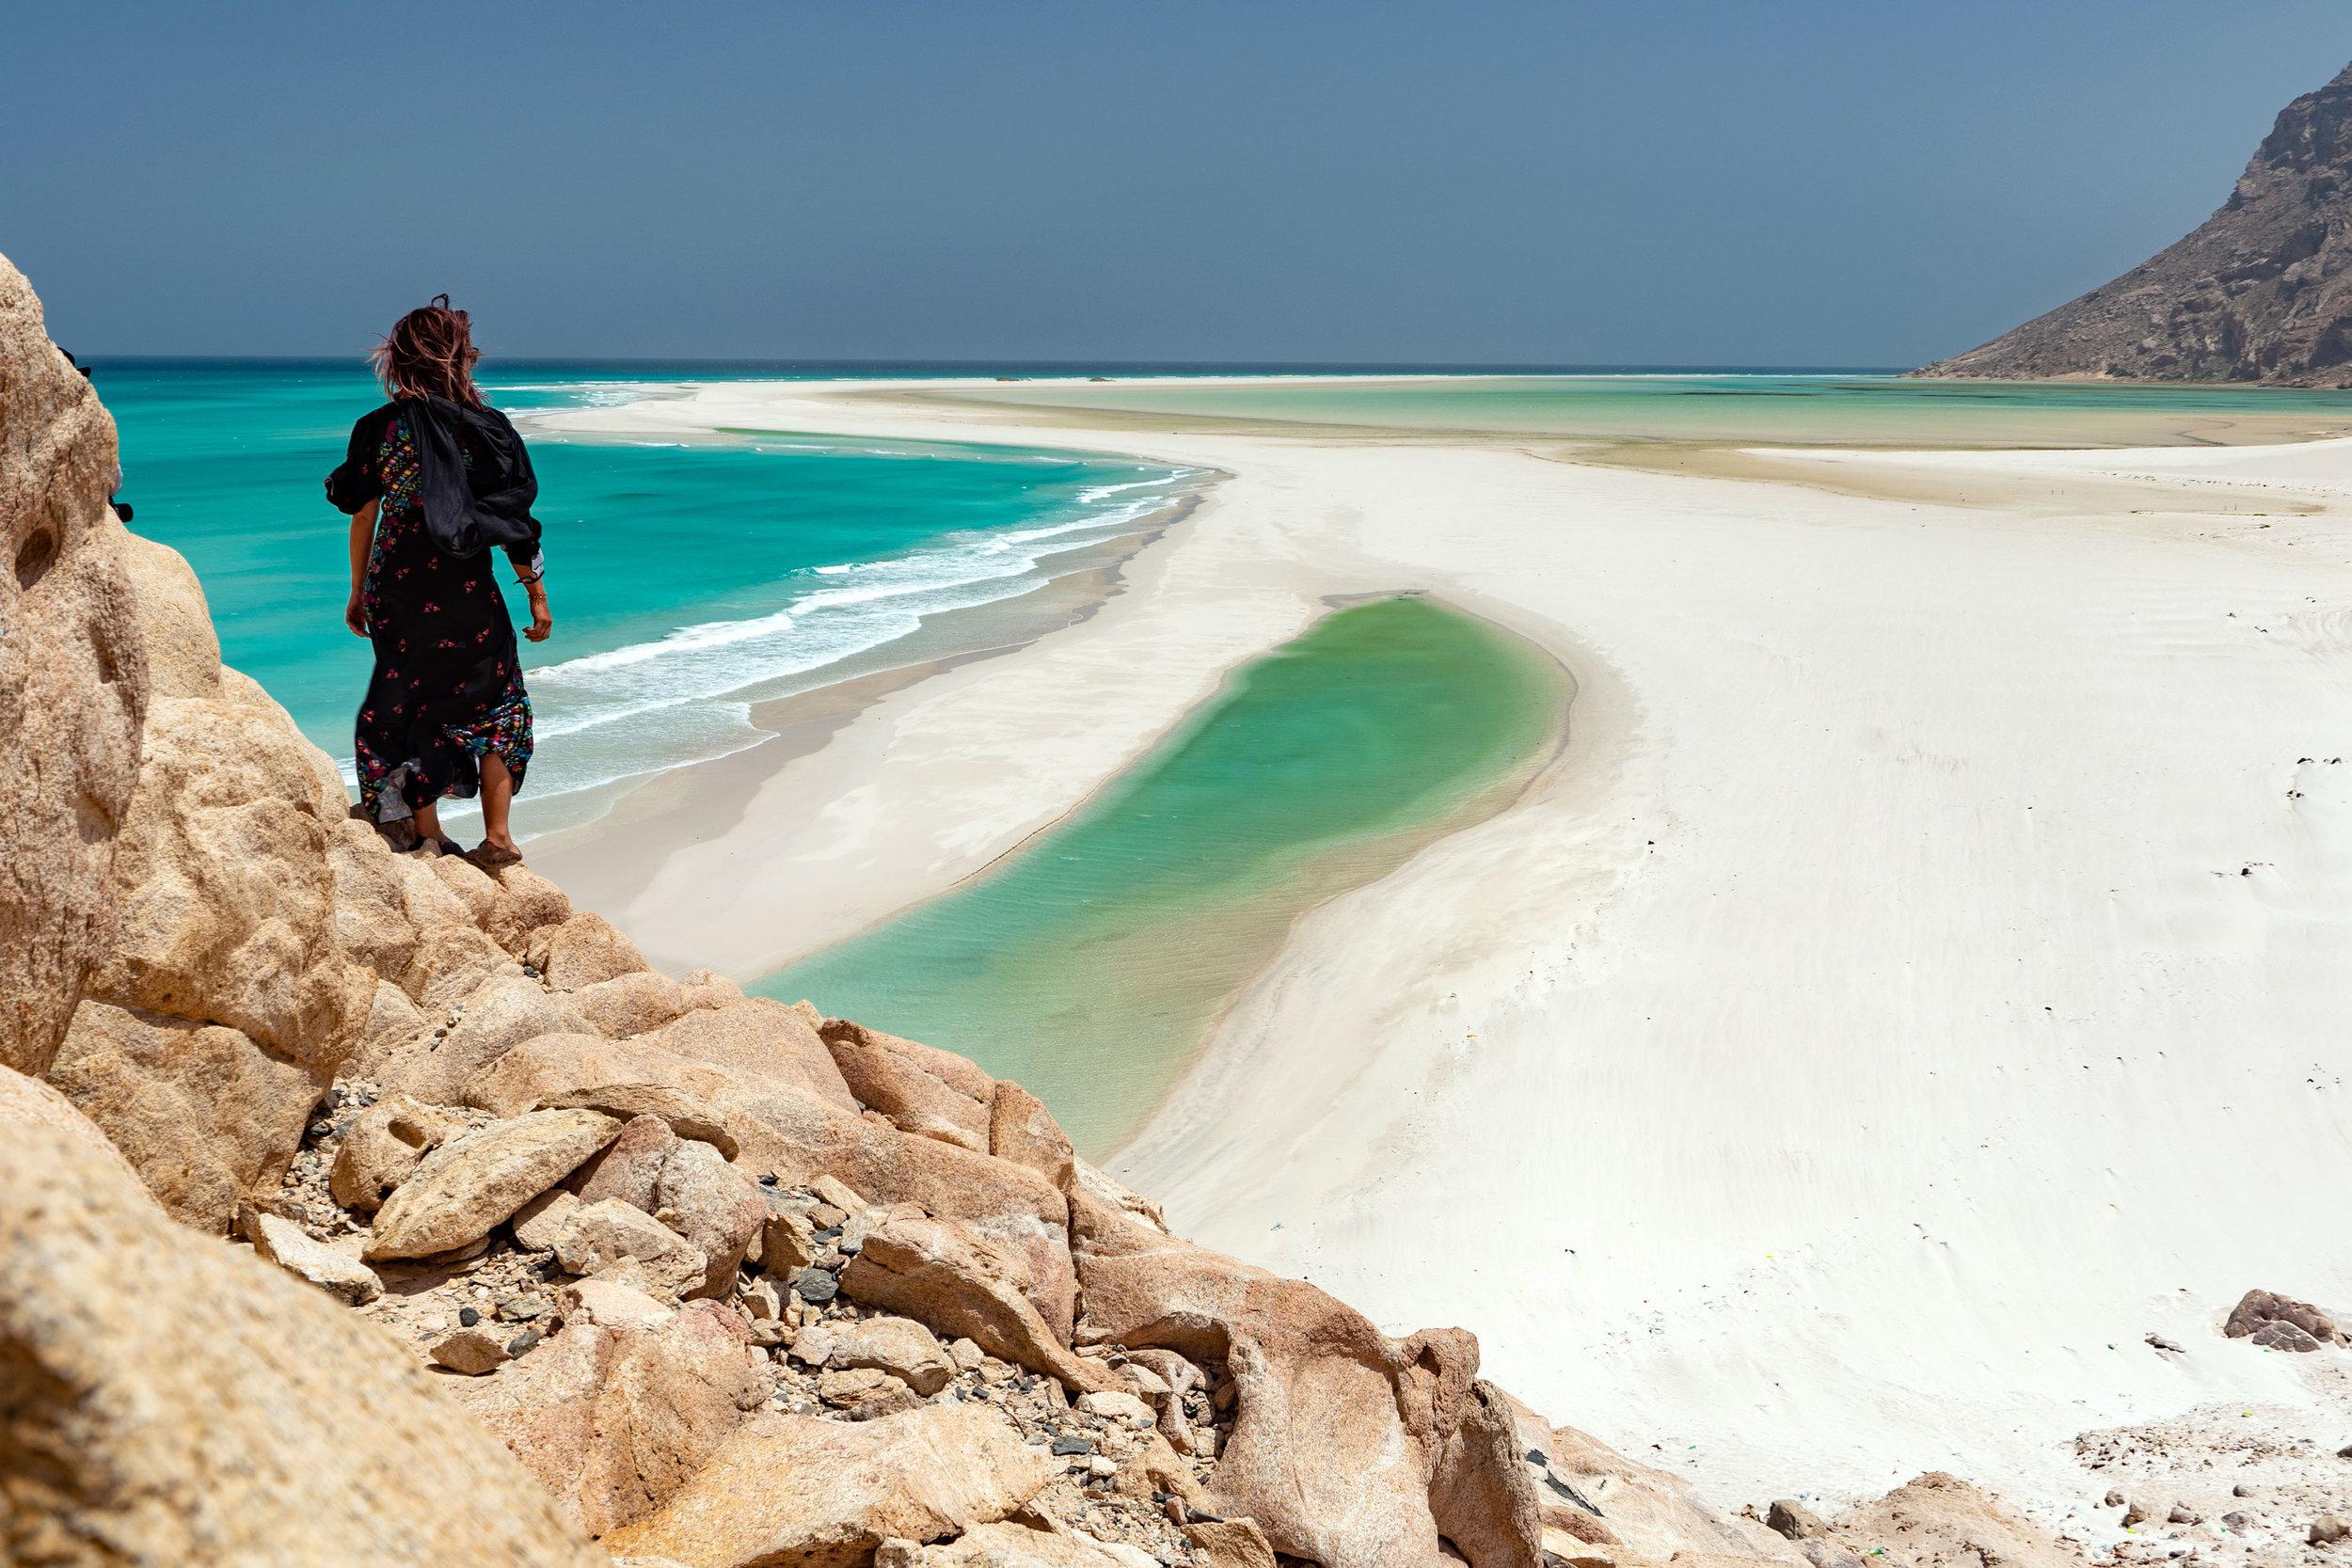 detwah-lagoon-detwa-beach-socotra-island-yemen-inertia-network.jpg